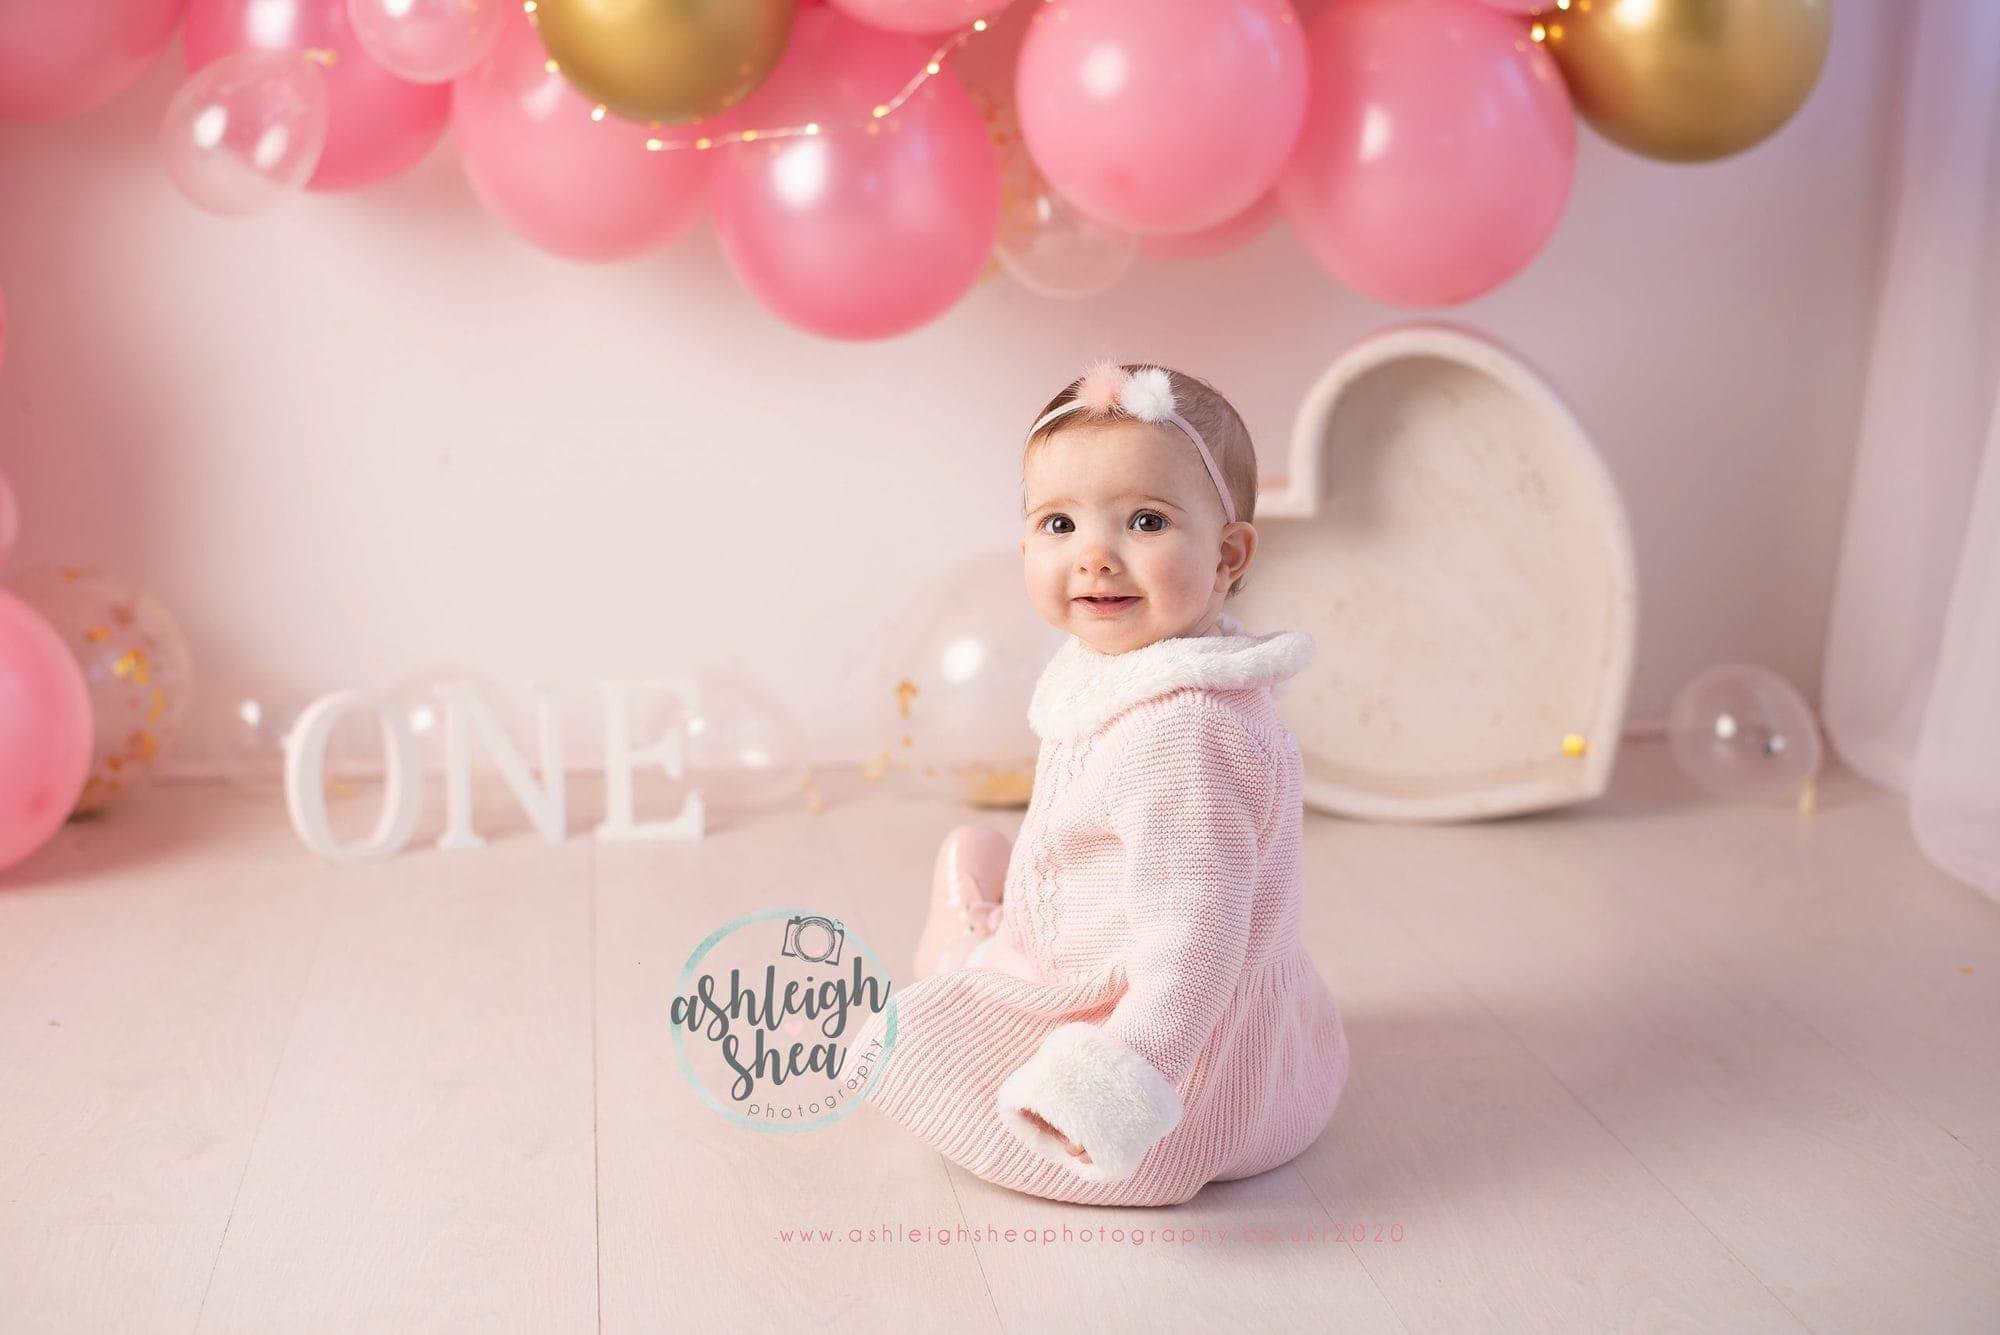 Orpington, Ashleigh Shea Photography, Cake Smash, Pink, Gold, One, Balloon Garland,